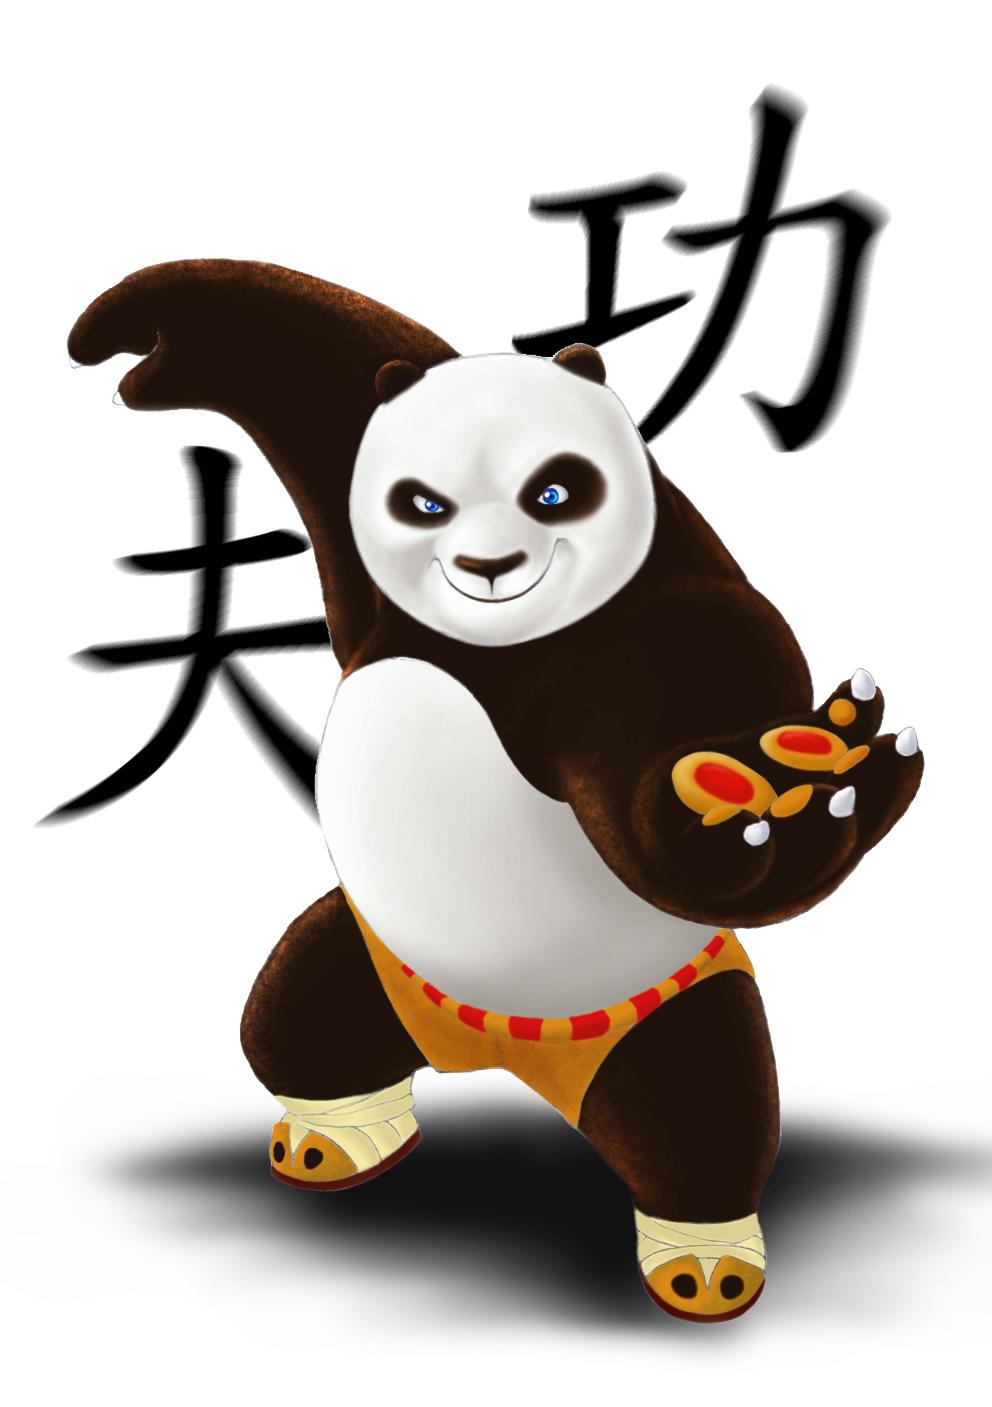 3d kung fu panda image